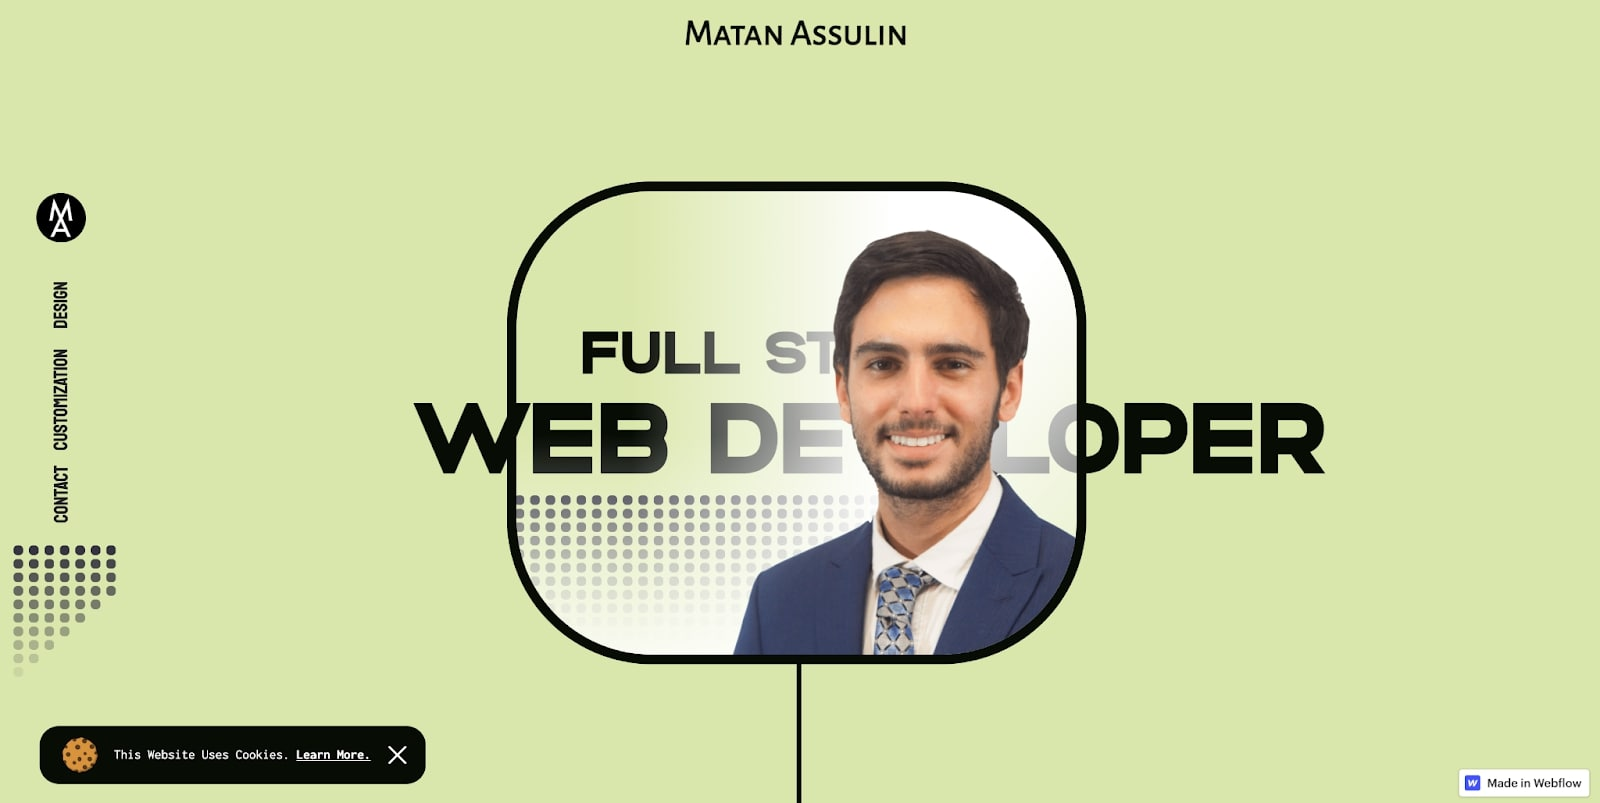 Matan Assulin's portfolio homepage